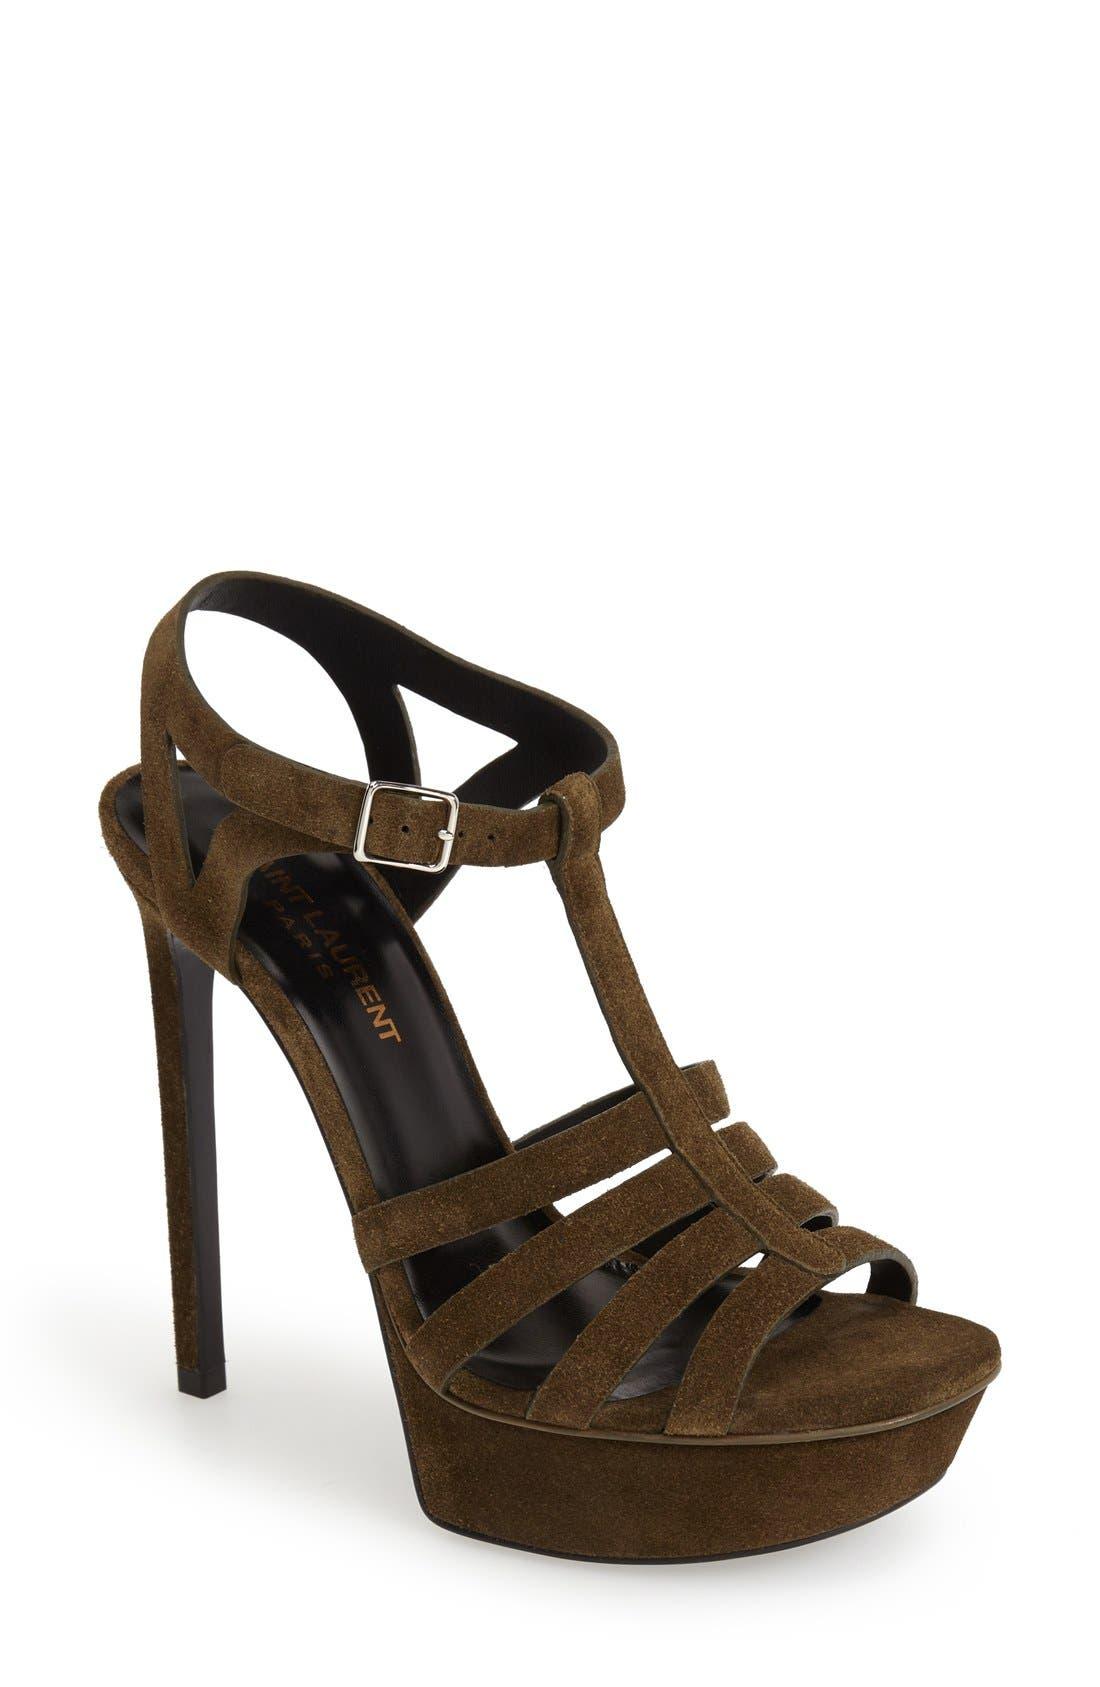 Main Image - Saint Laurent 'Bianca' Platform Sandal (Women)